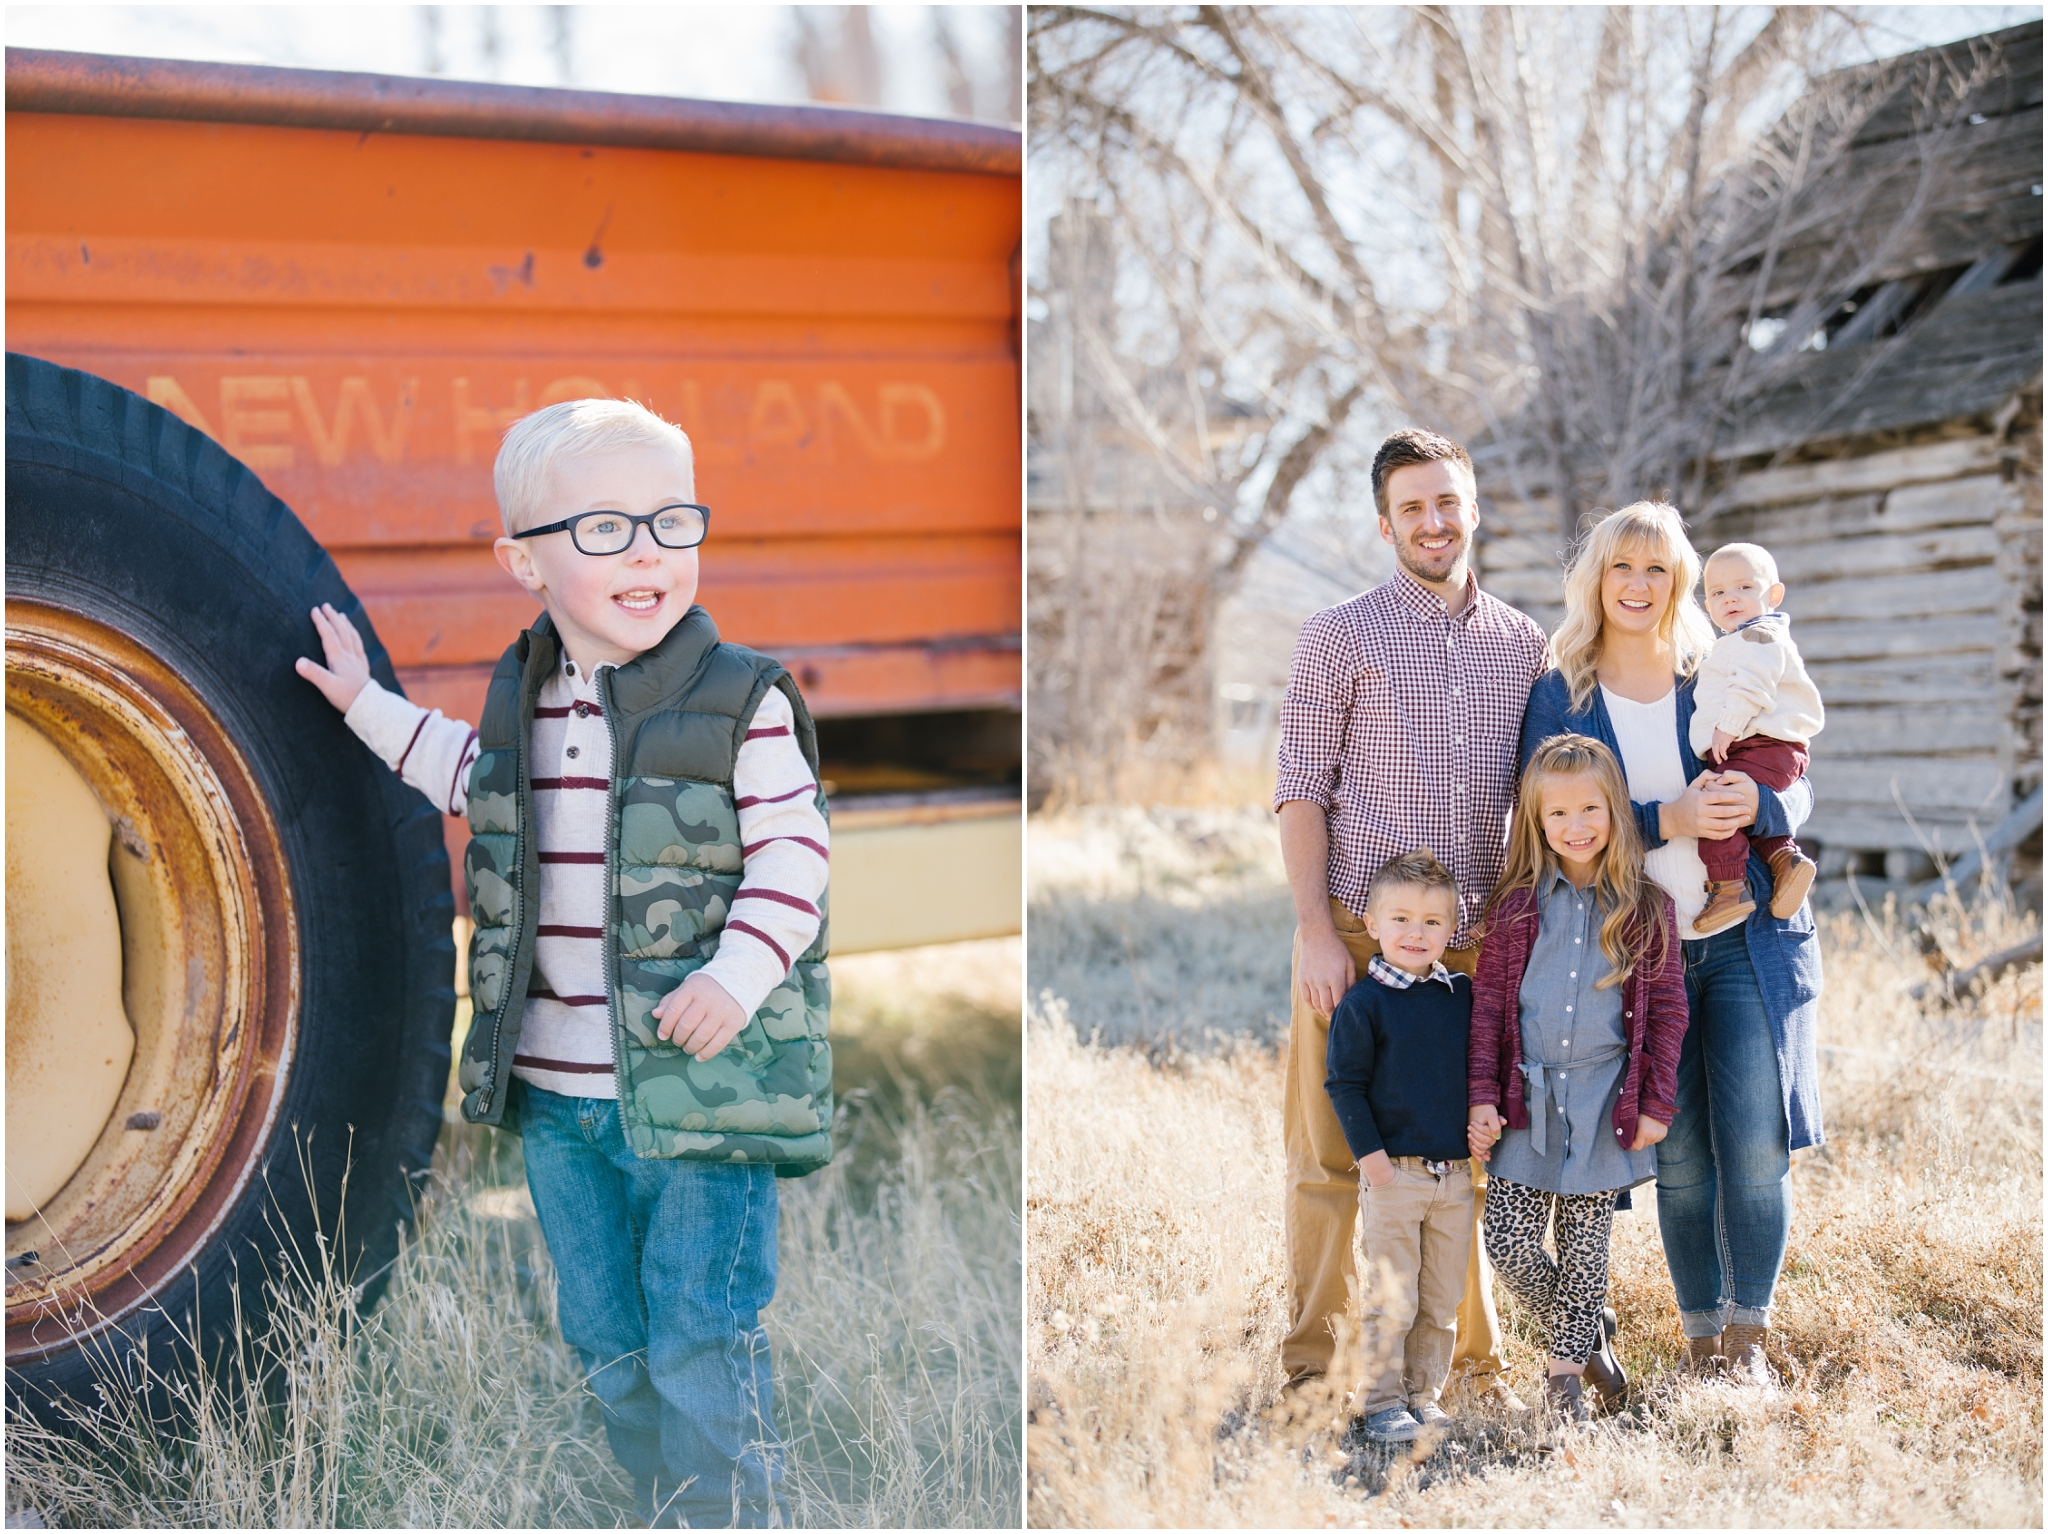 Laws-70_Lizzie-B-Imagery-Utah-Family-Photographer-Salt-Lake-City-Park-City-Davis-County-Clearfield.jpg